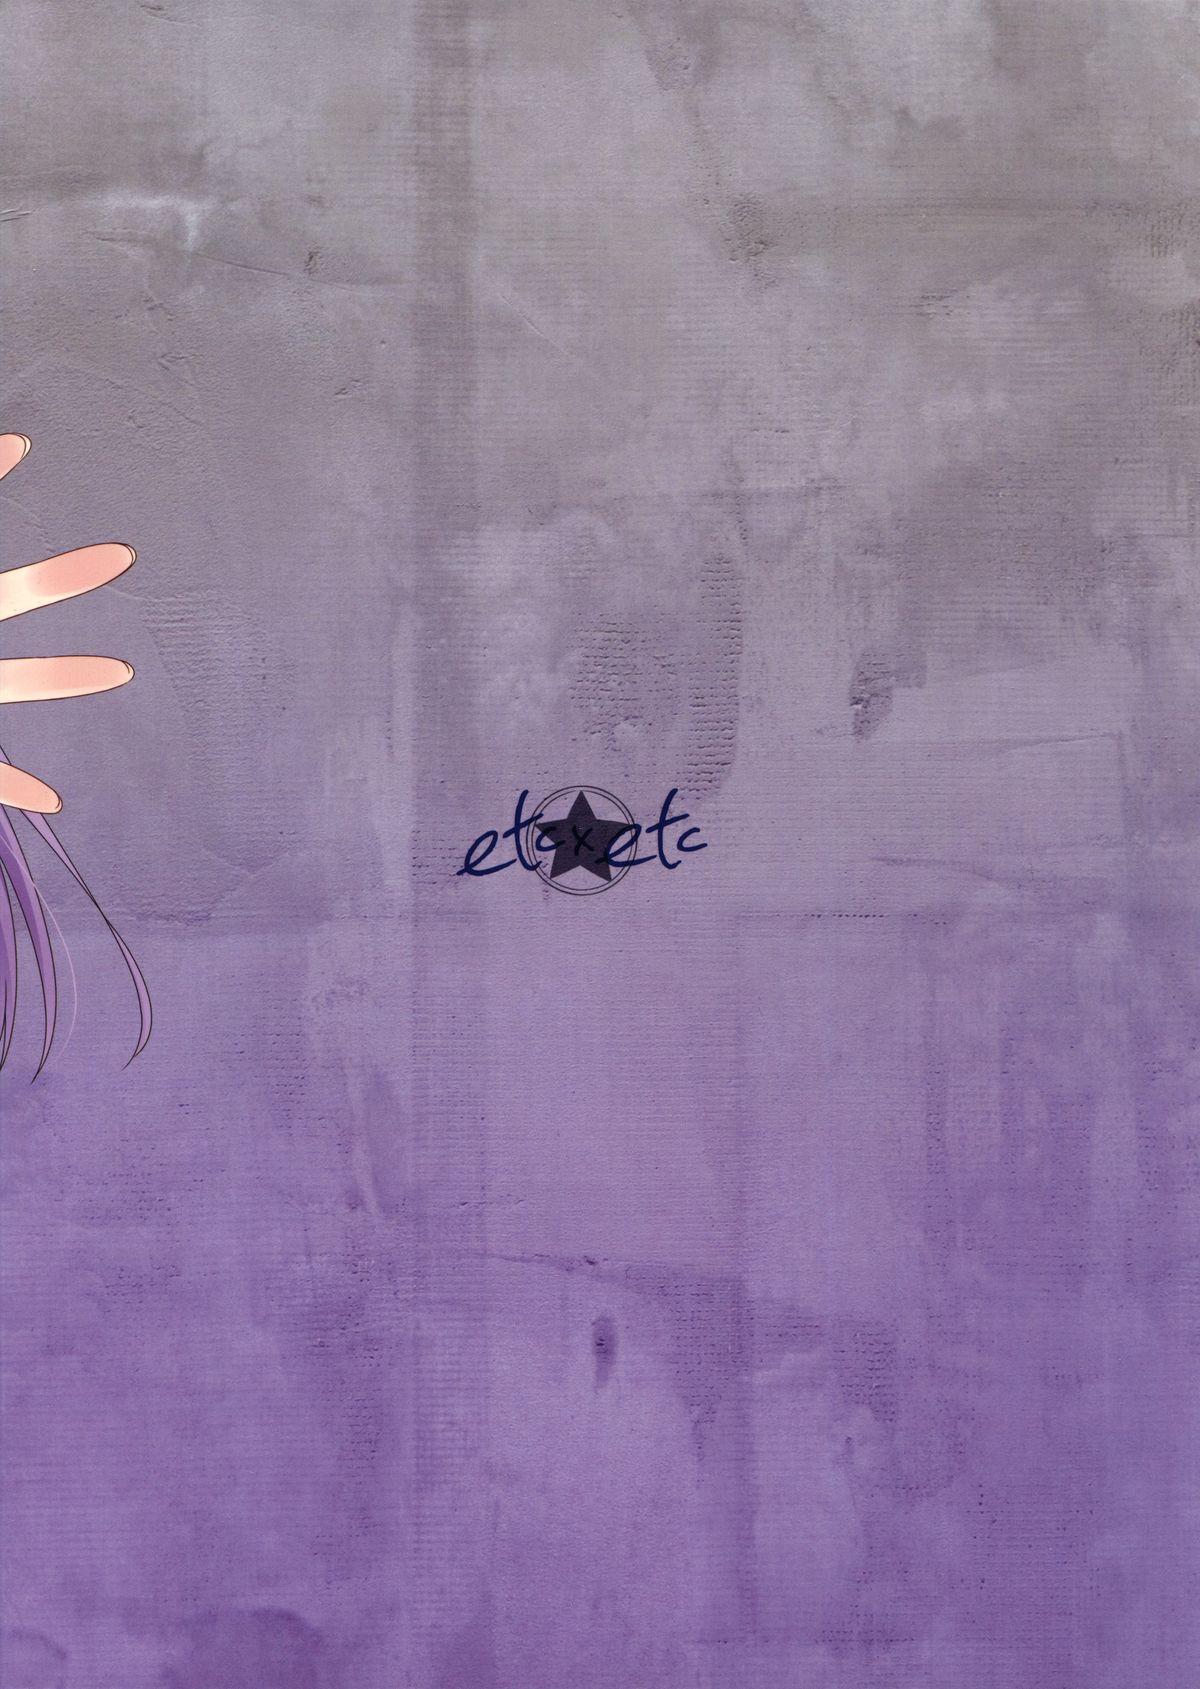 Hyouka no Diva | Ice Flower Diva 21